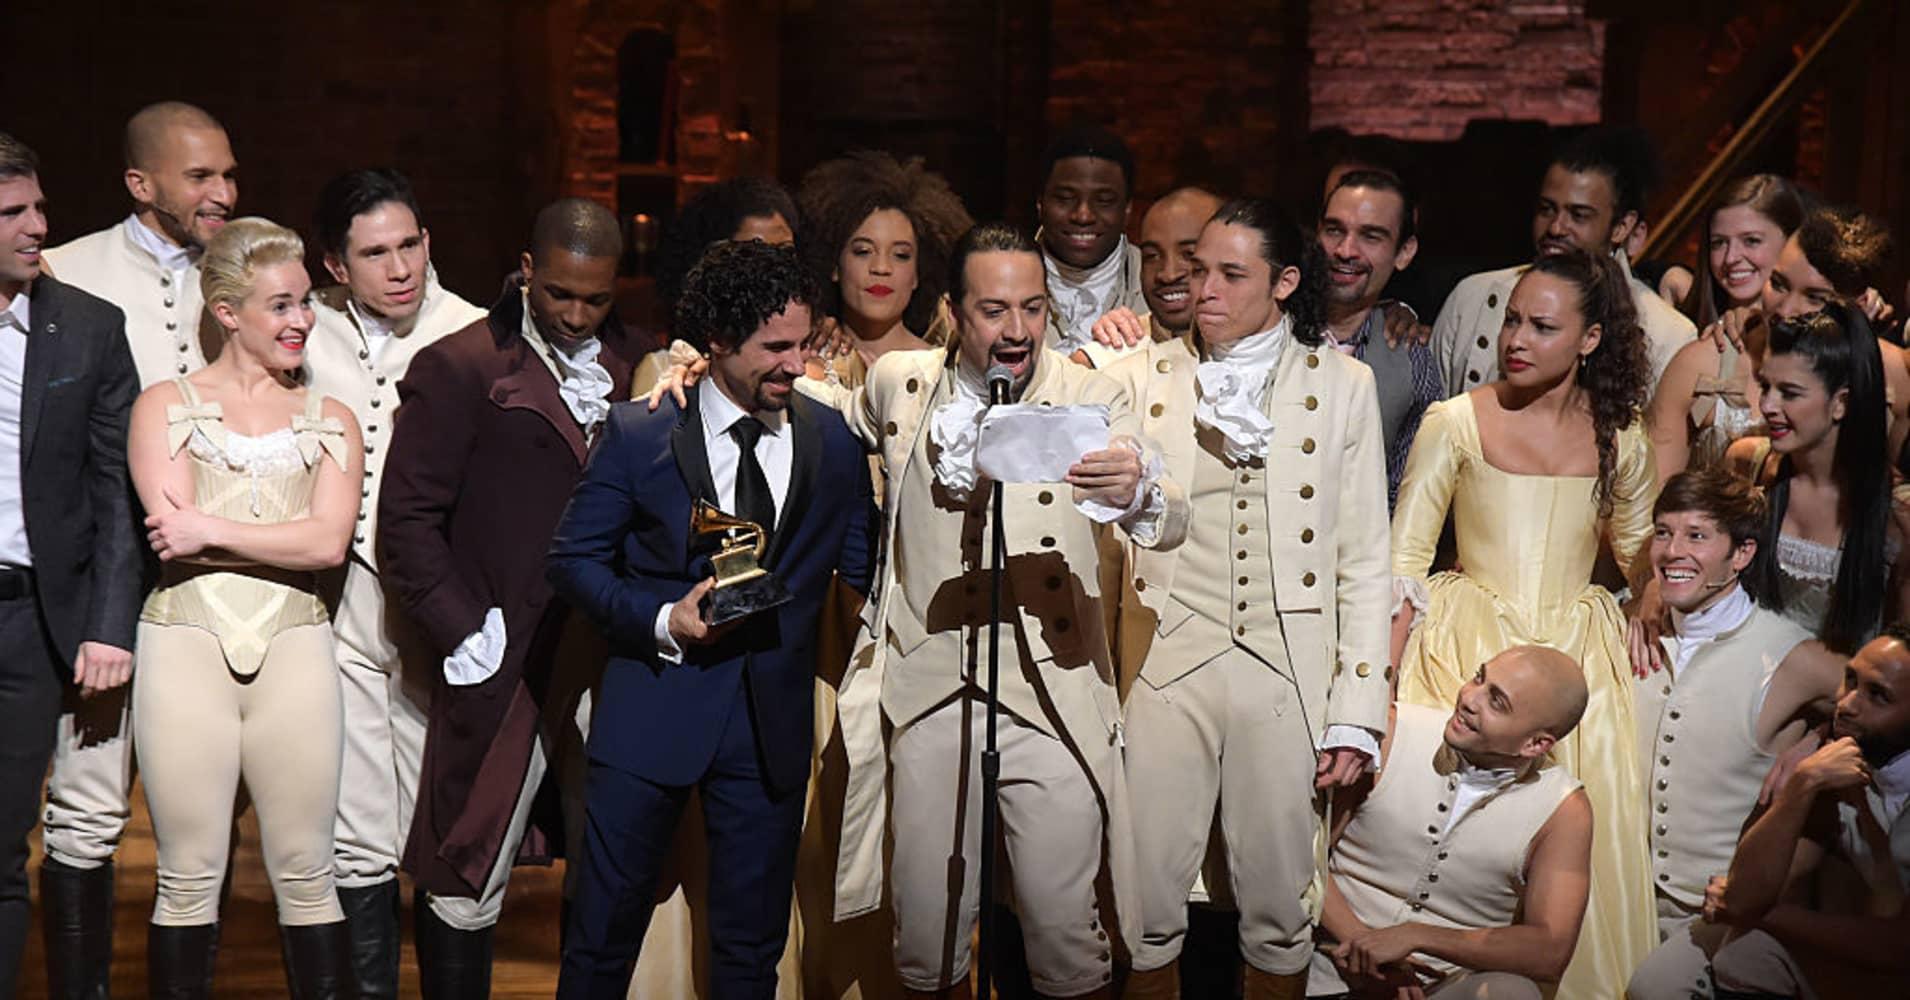 hamilton musical was no overnight success says creator lin